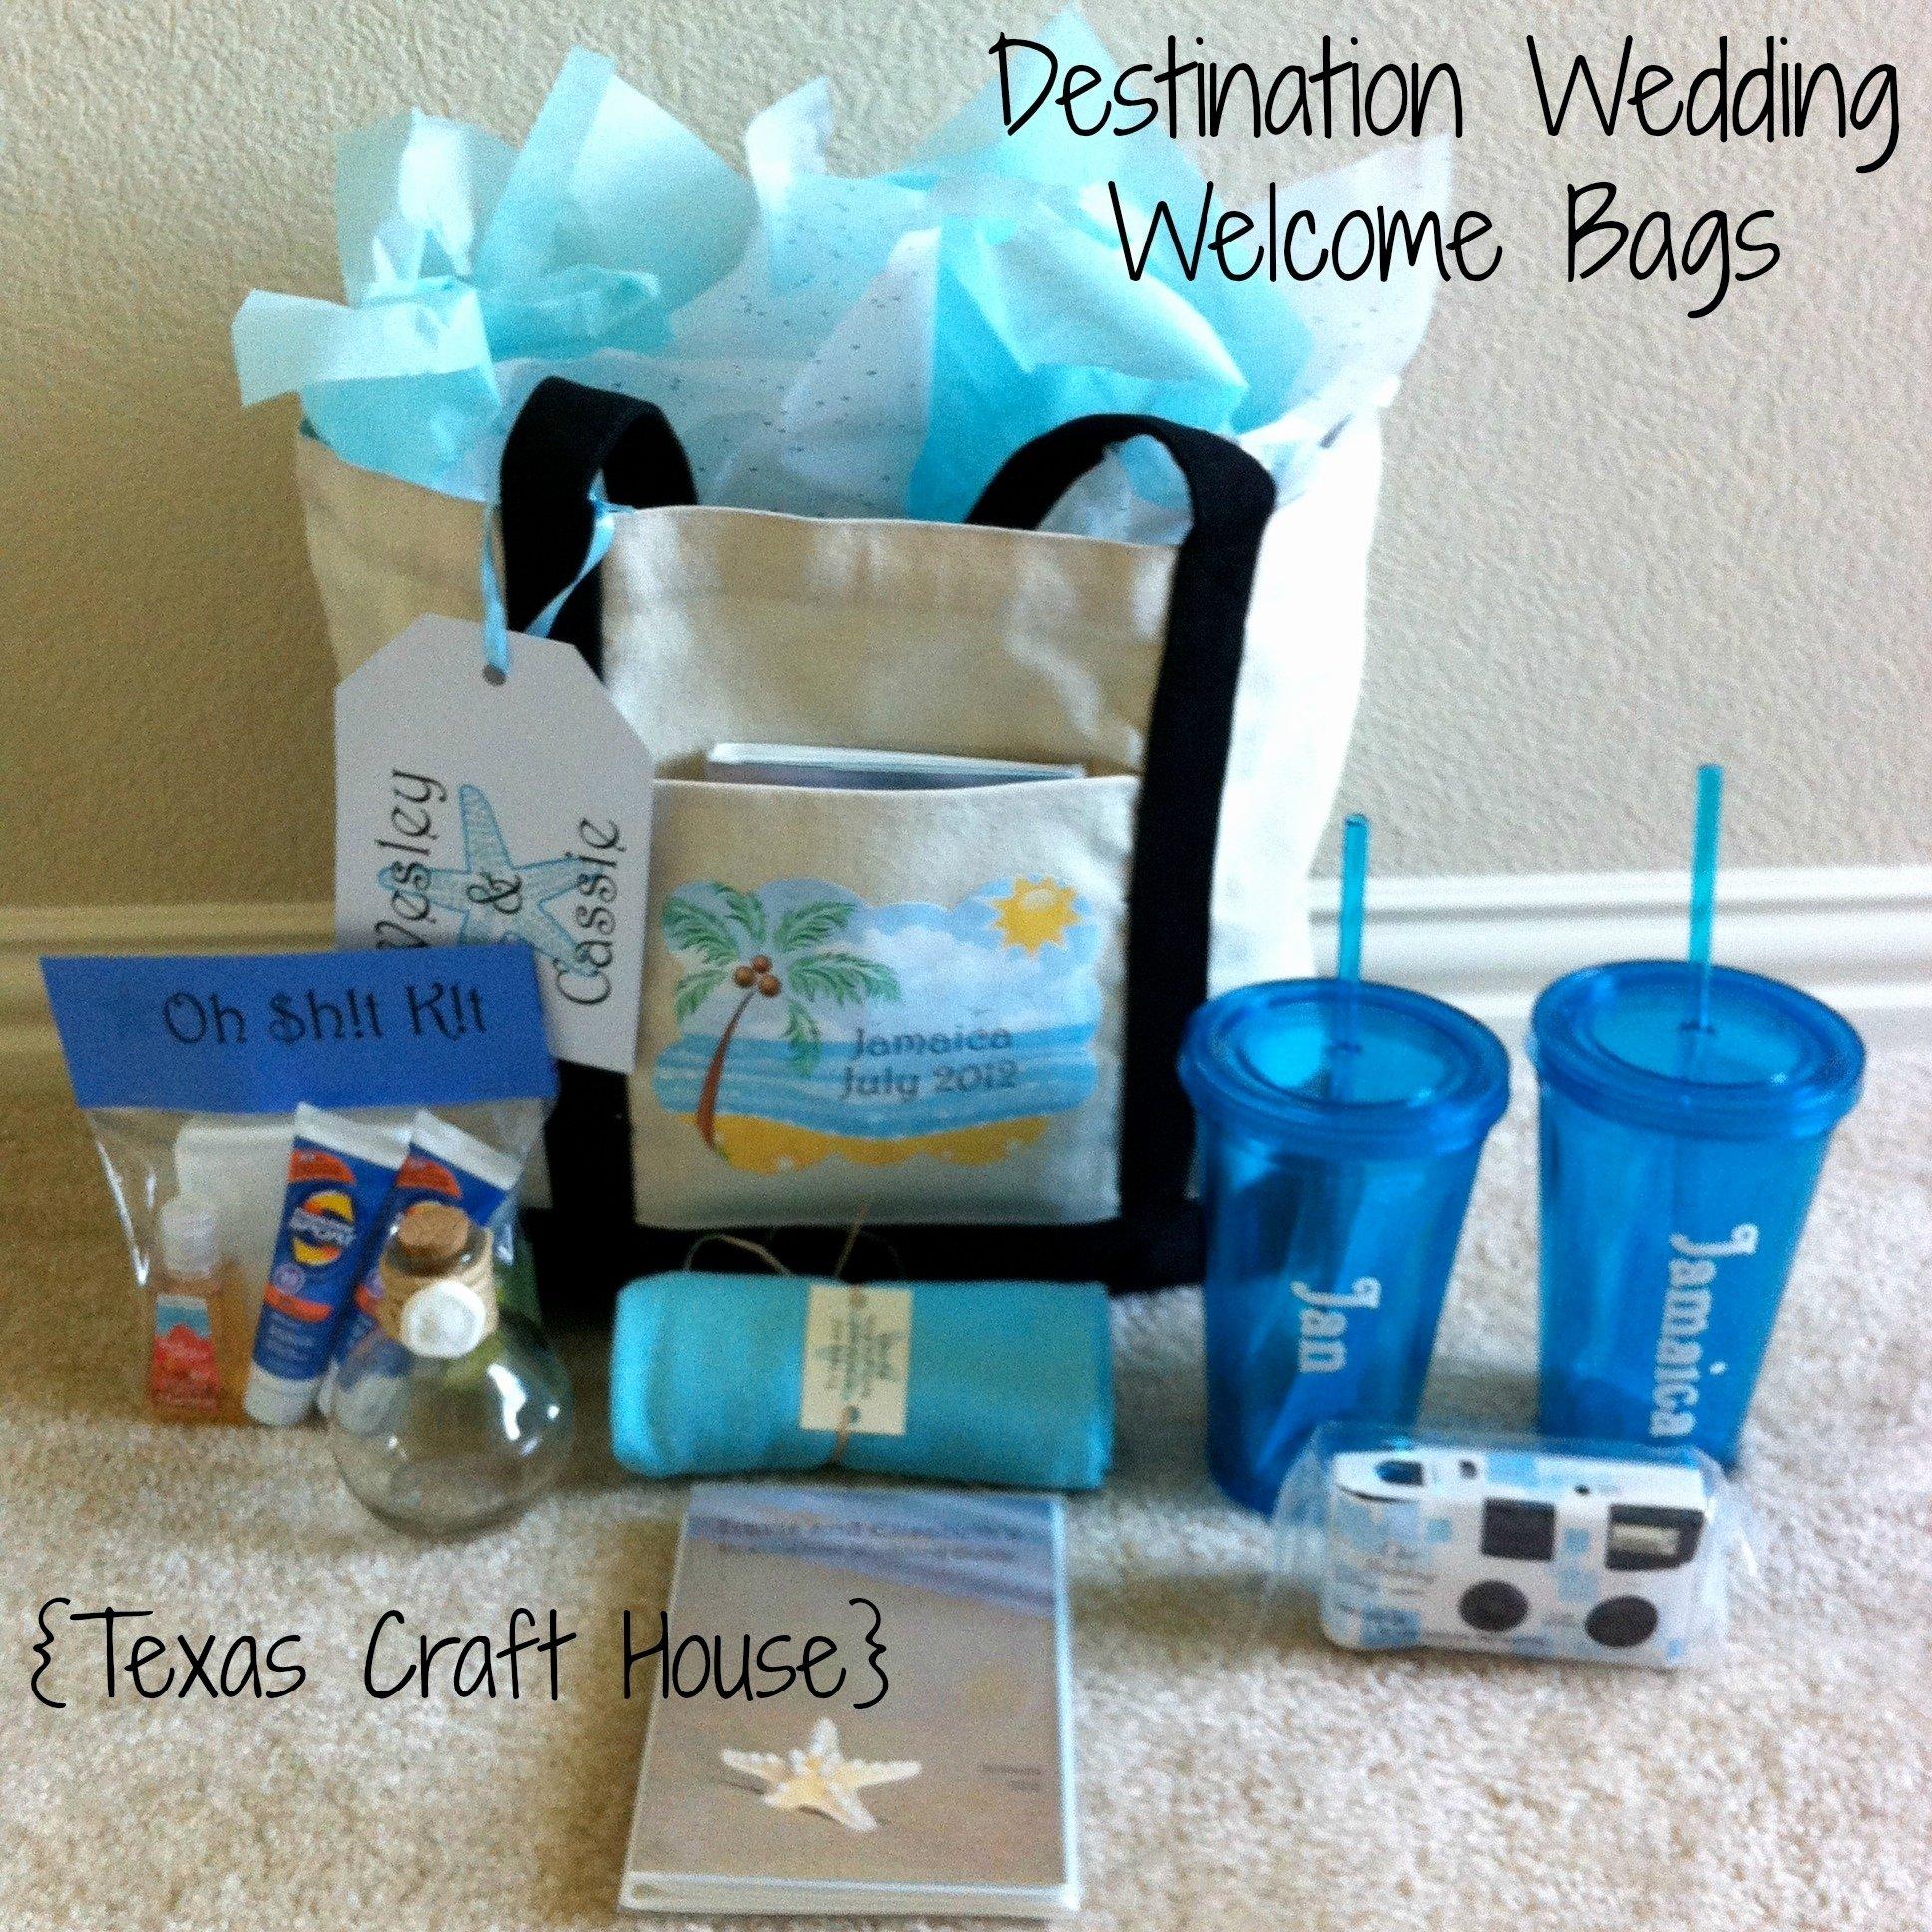 10 Fabulous Destination Wedding Gift Bag Ideas